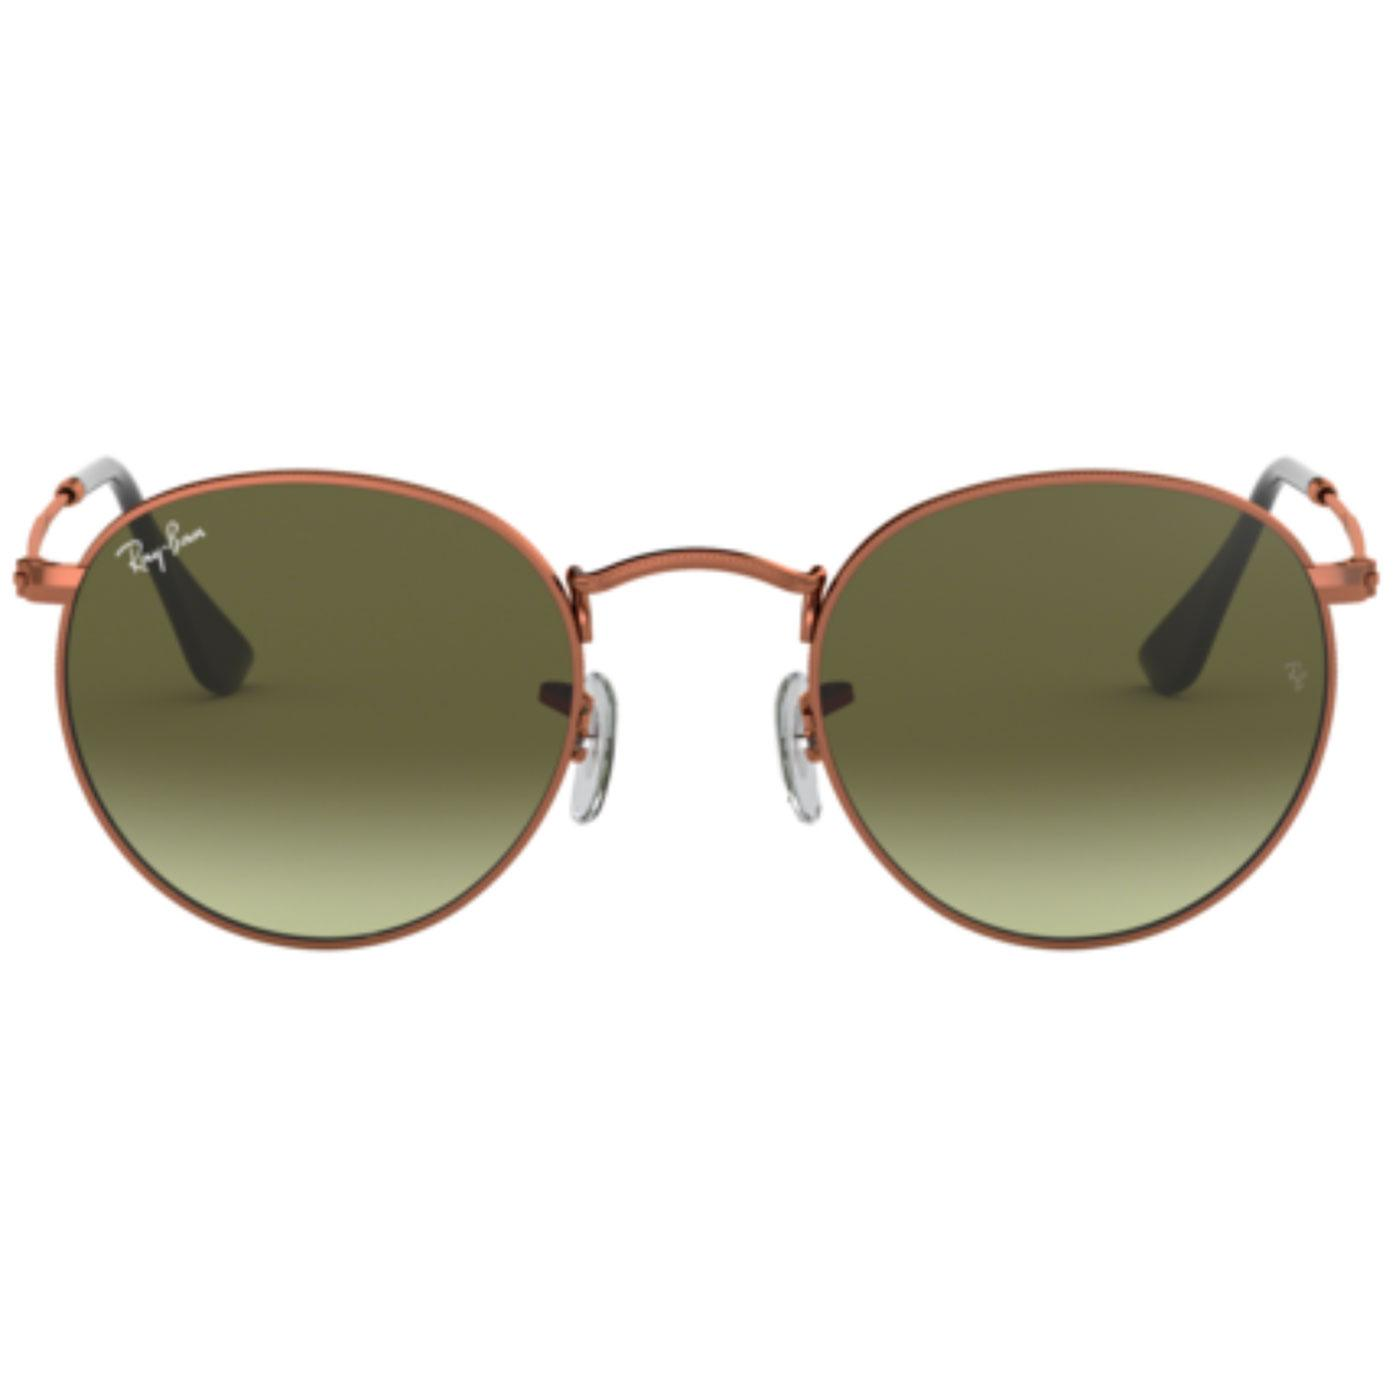 RAY-BAN Retro Mod Sixties Bronze Round Sunglasses